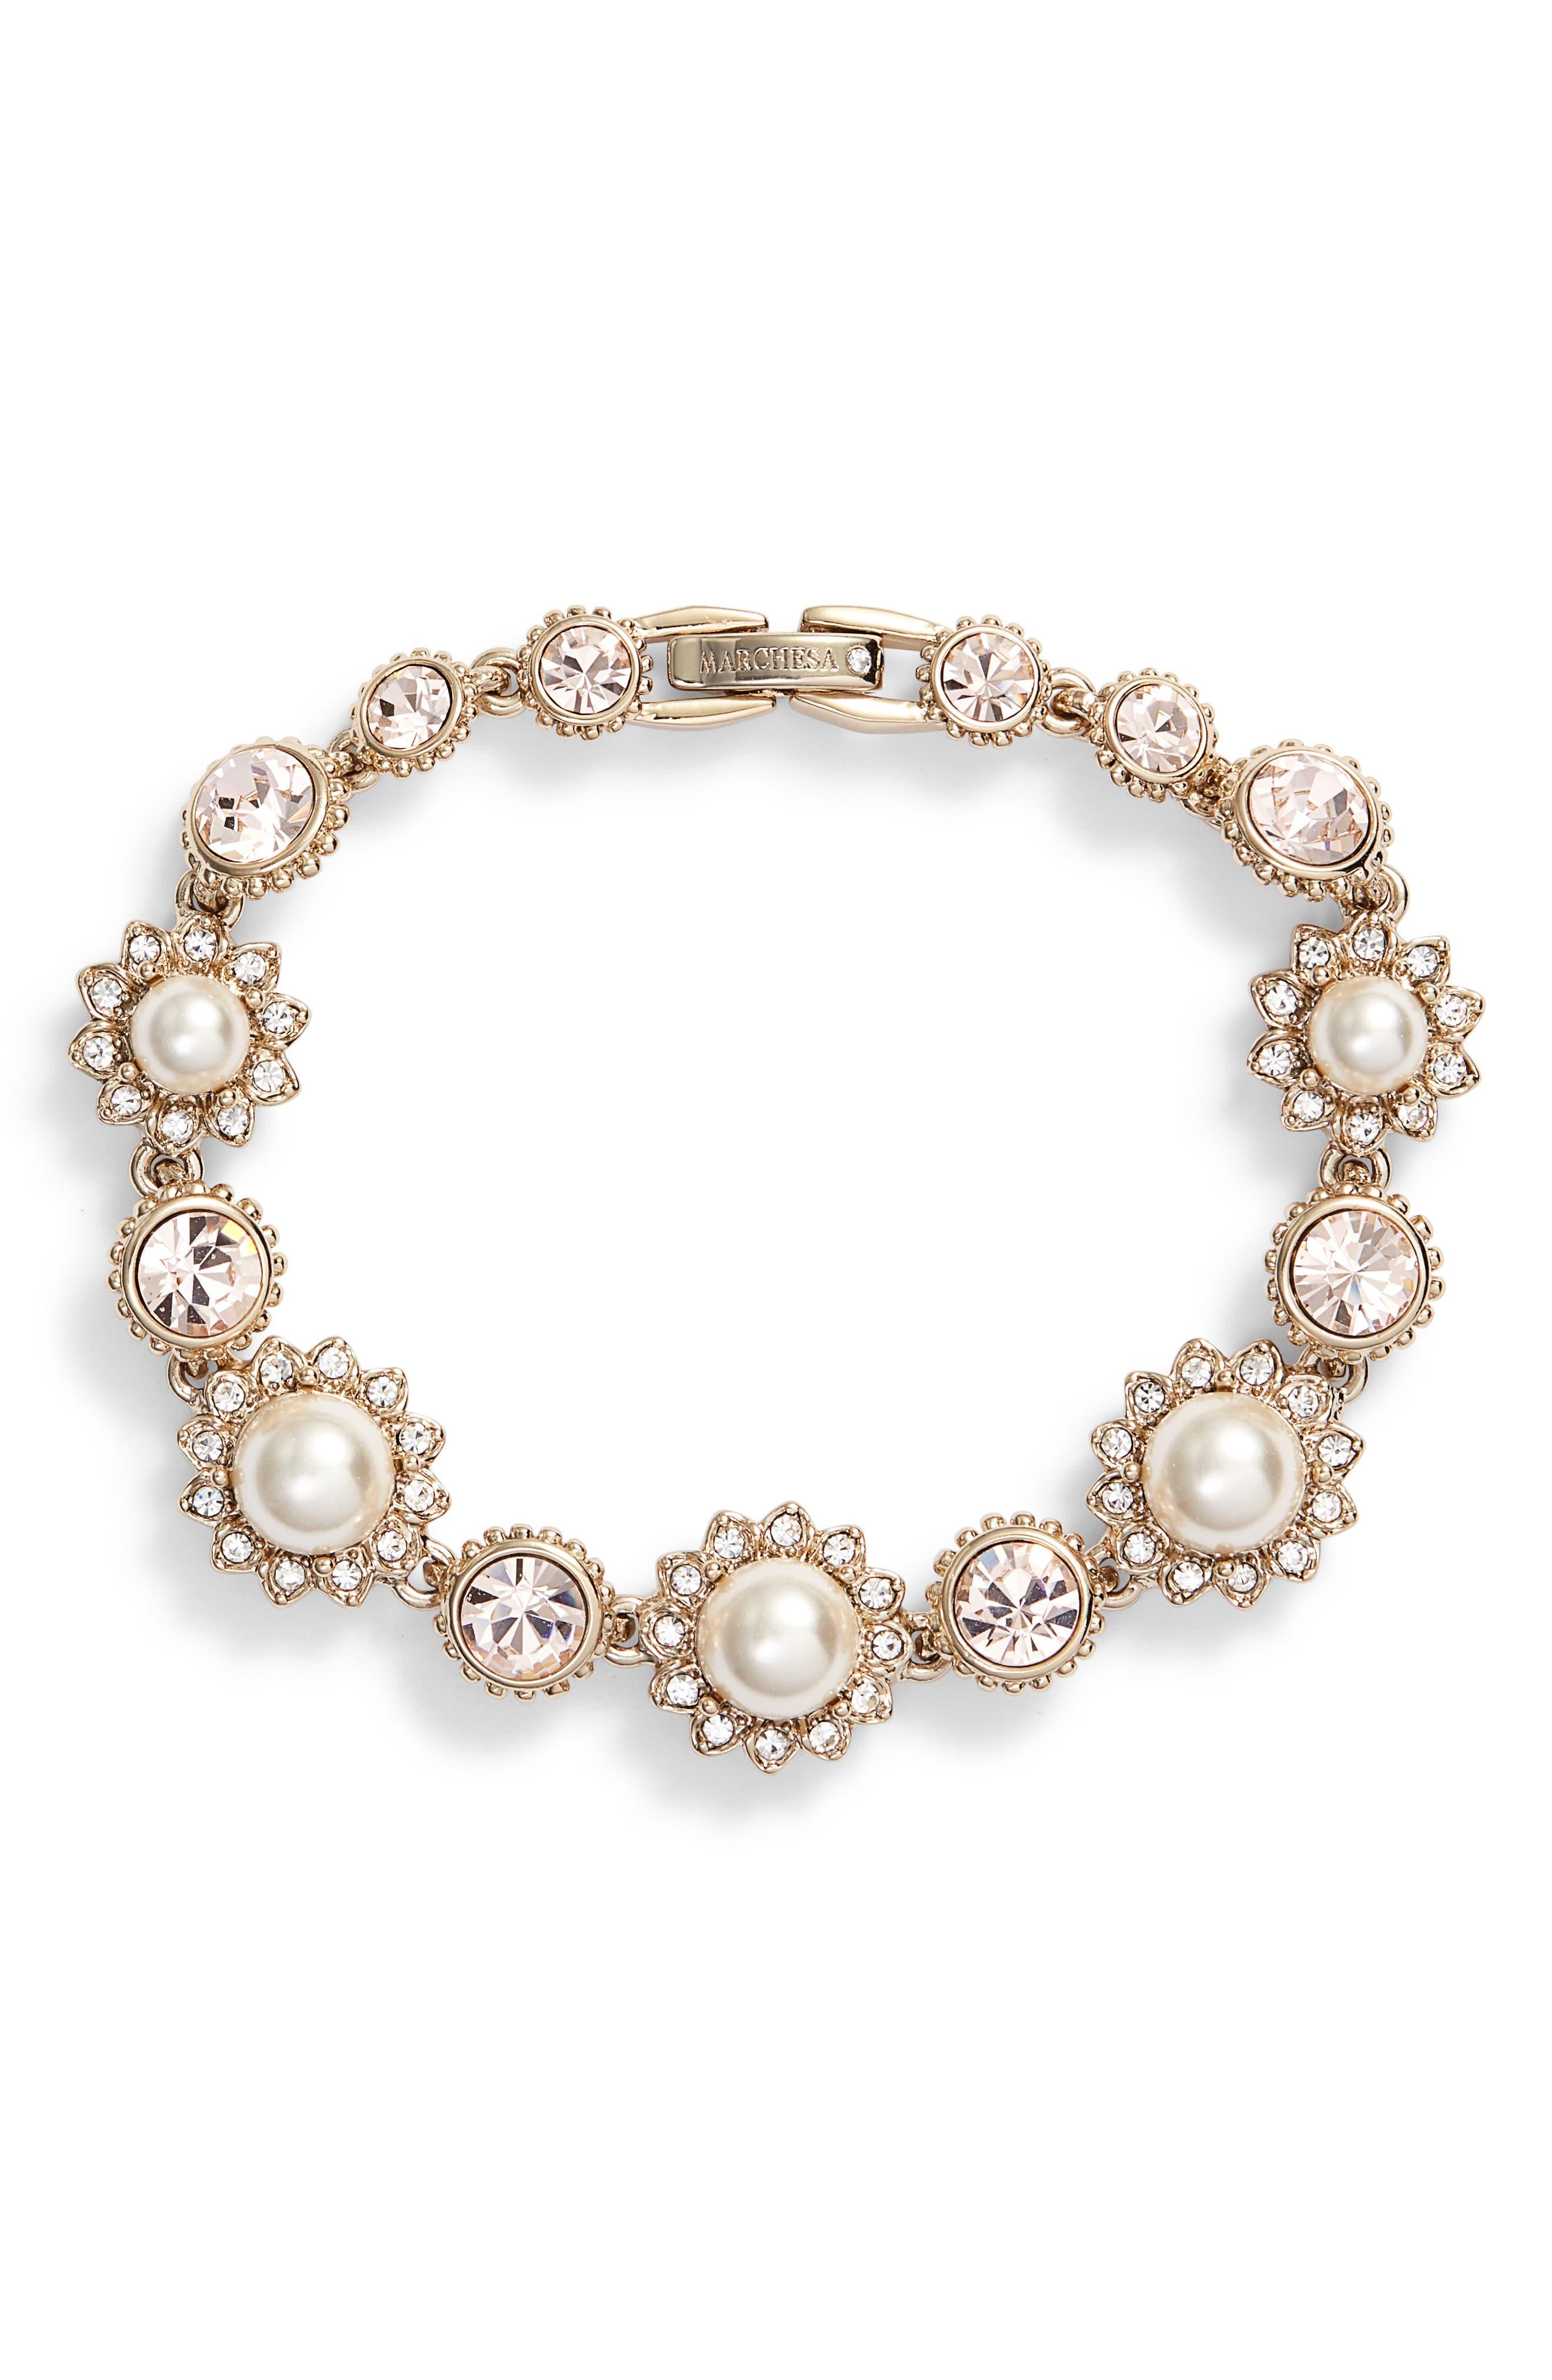 MARCHESA, Imitation Pearl Line Bracelet, Main thumbnail 1, color, CREAM/ SILK/ GOLD